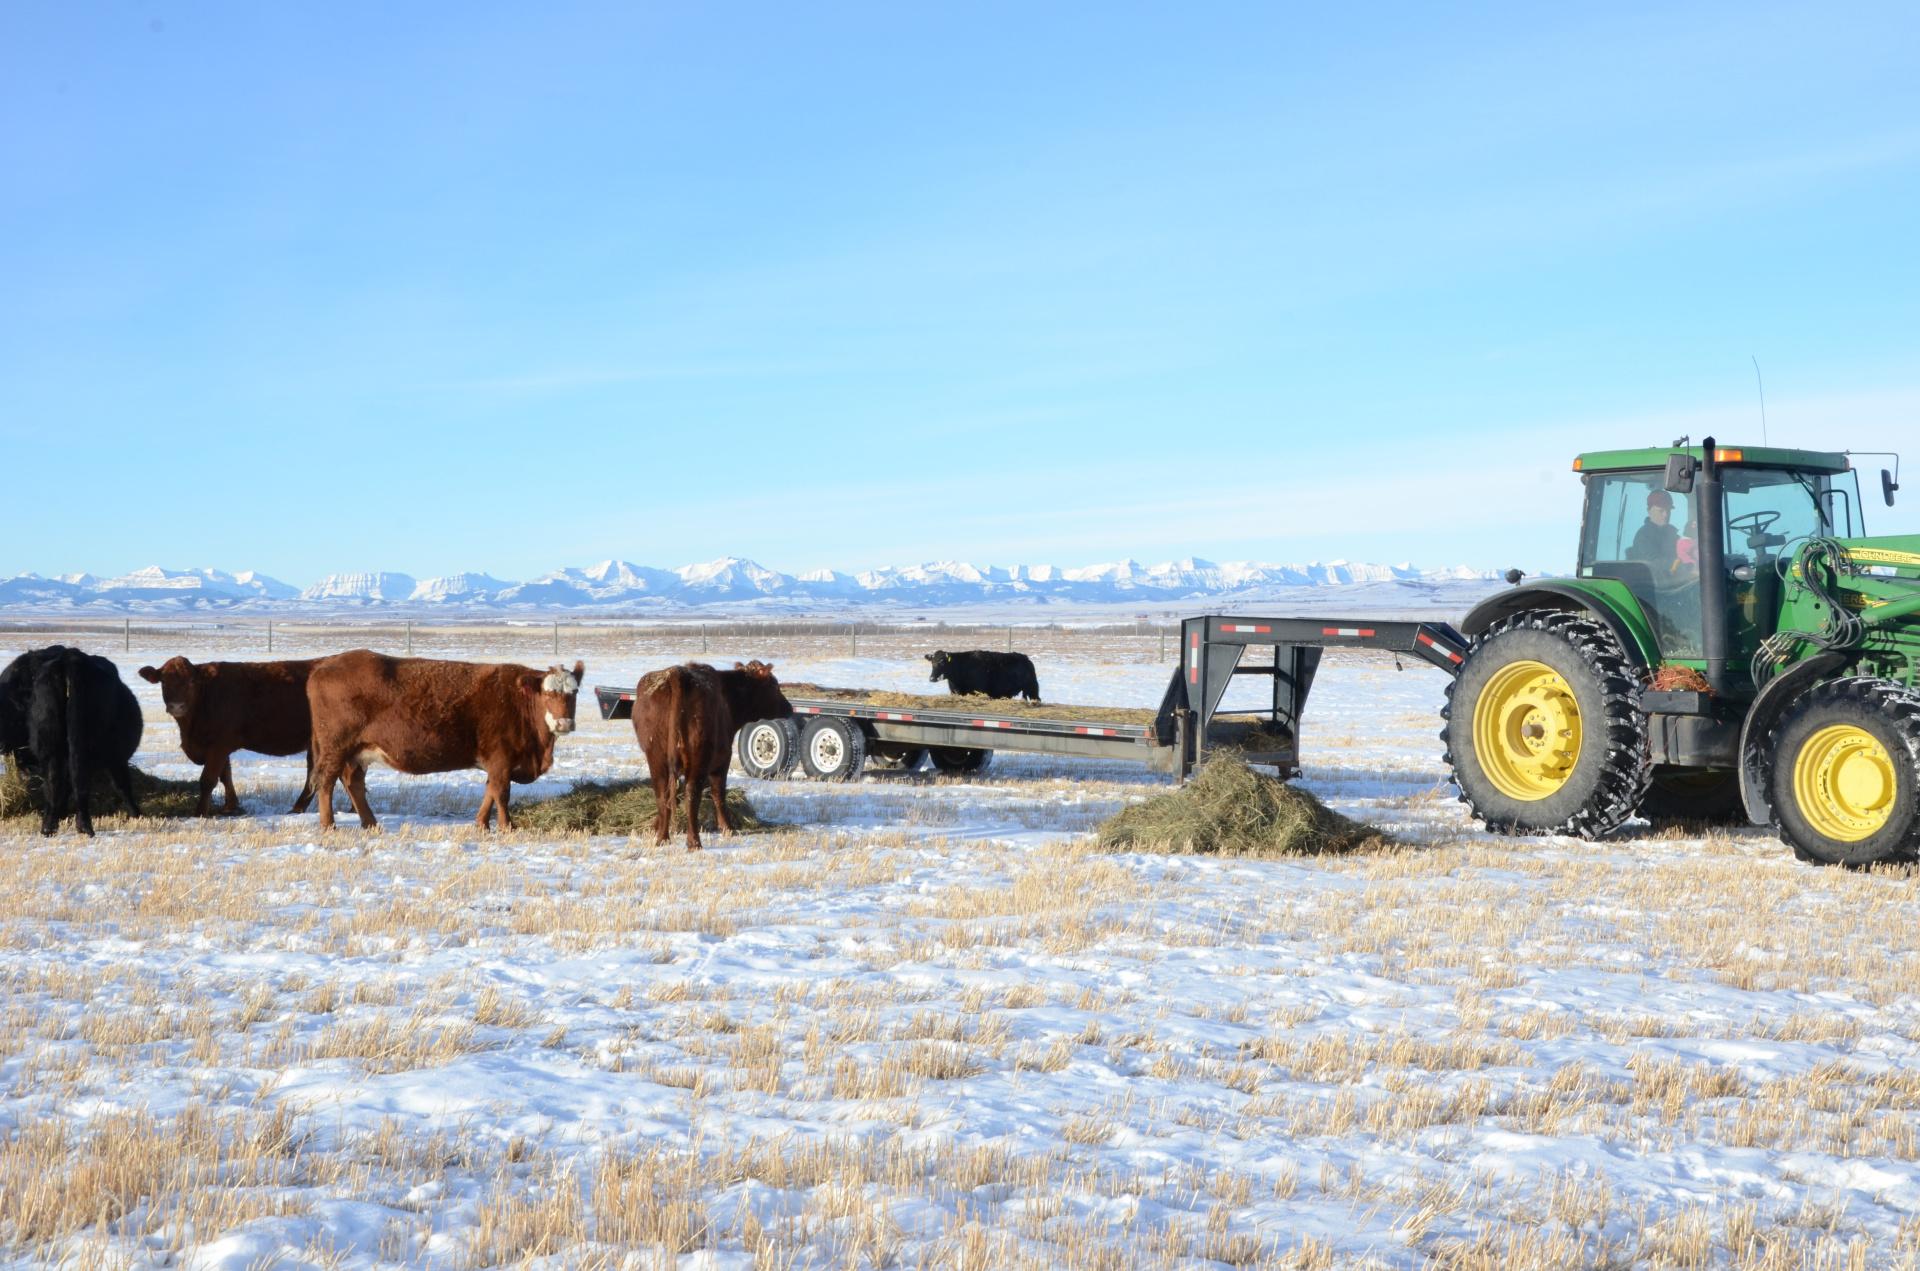 Feeding in the winter